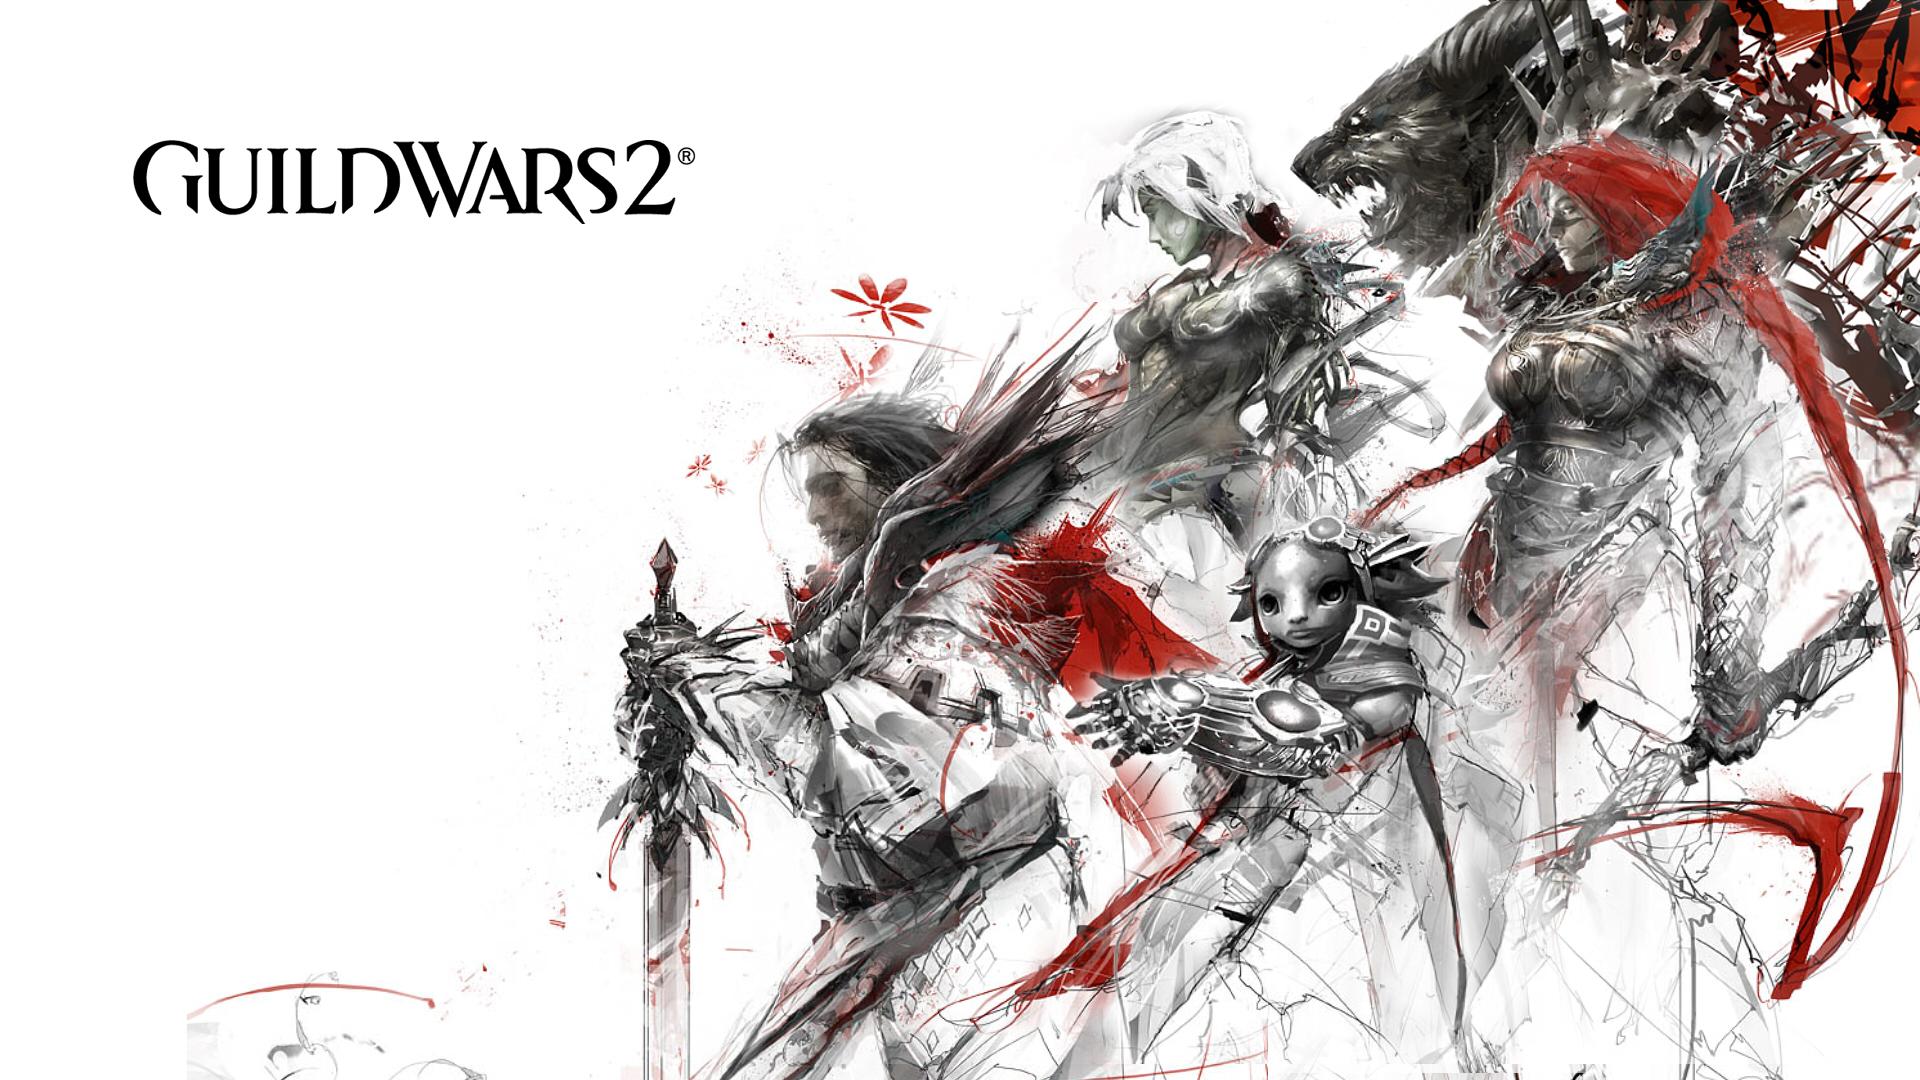 Guild Wars 2 Wallpaper By Namgung On Deviantart